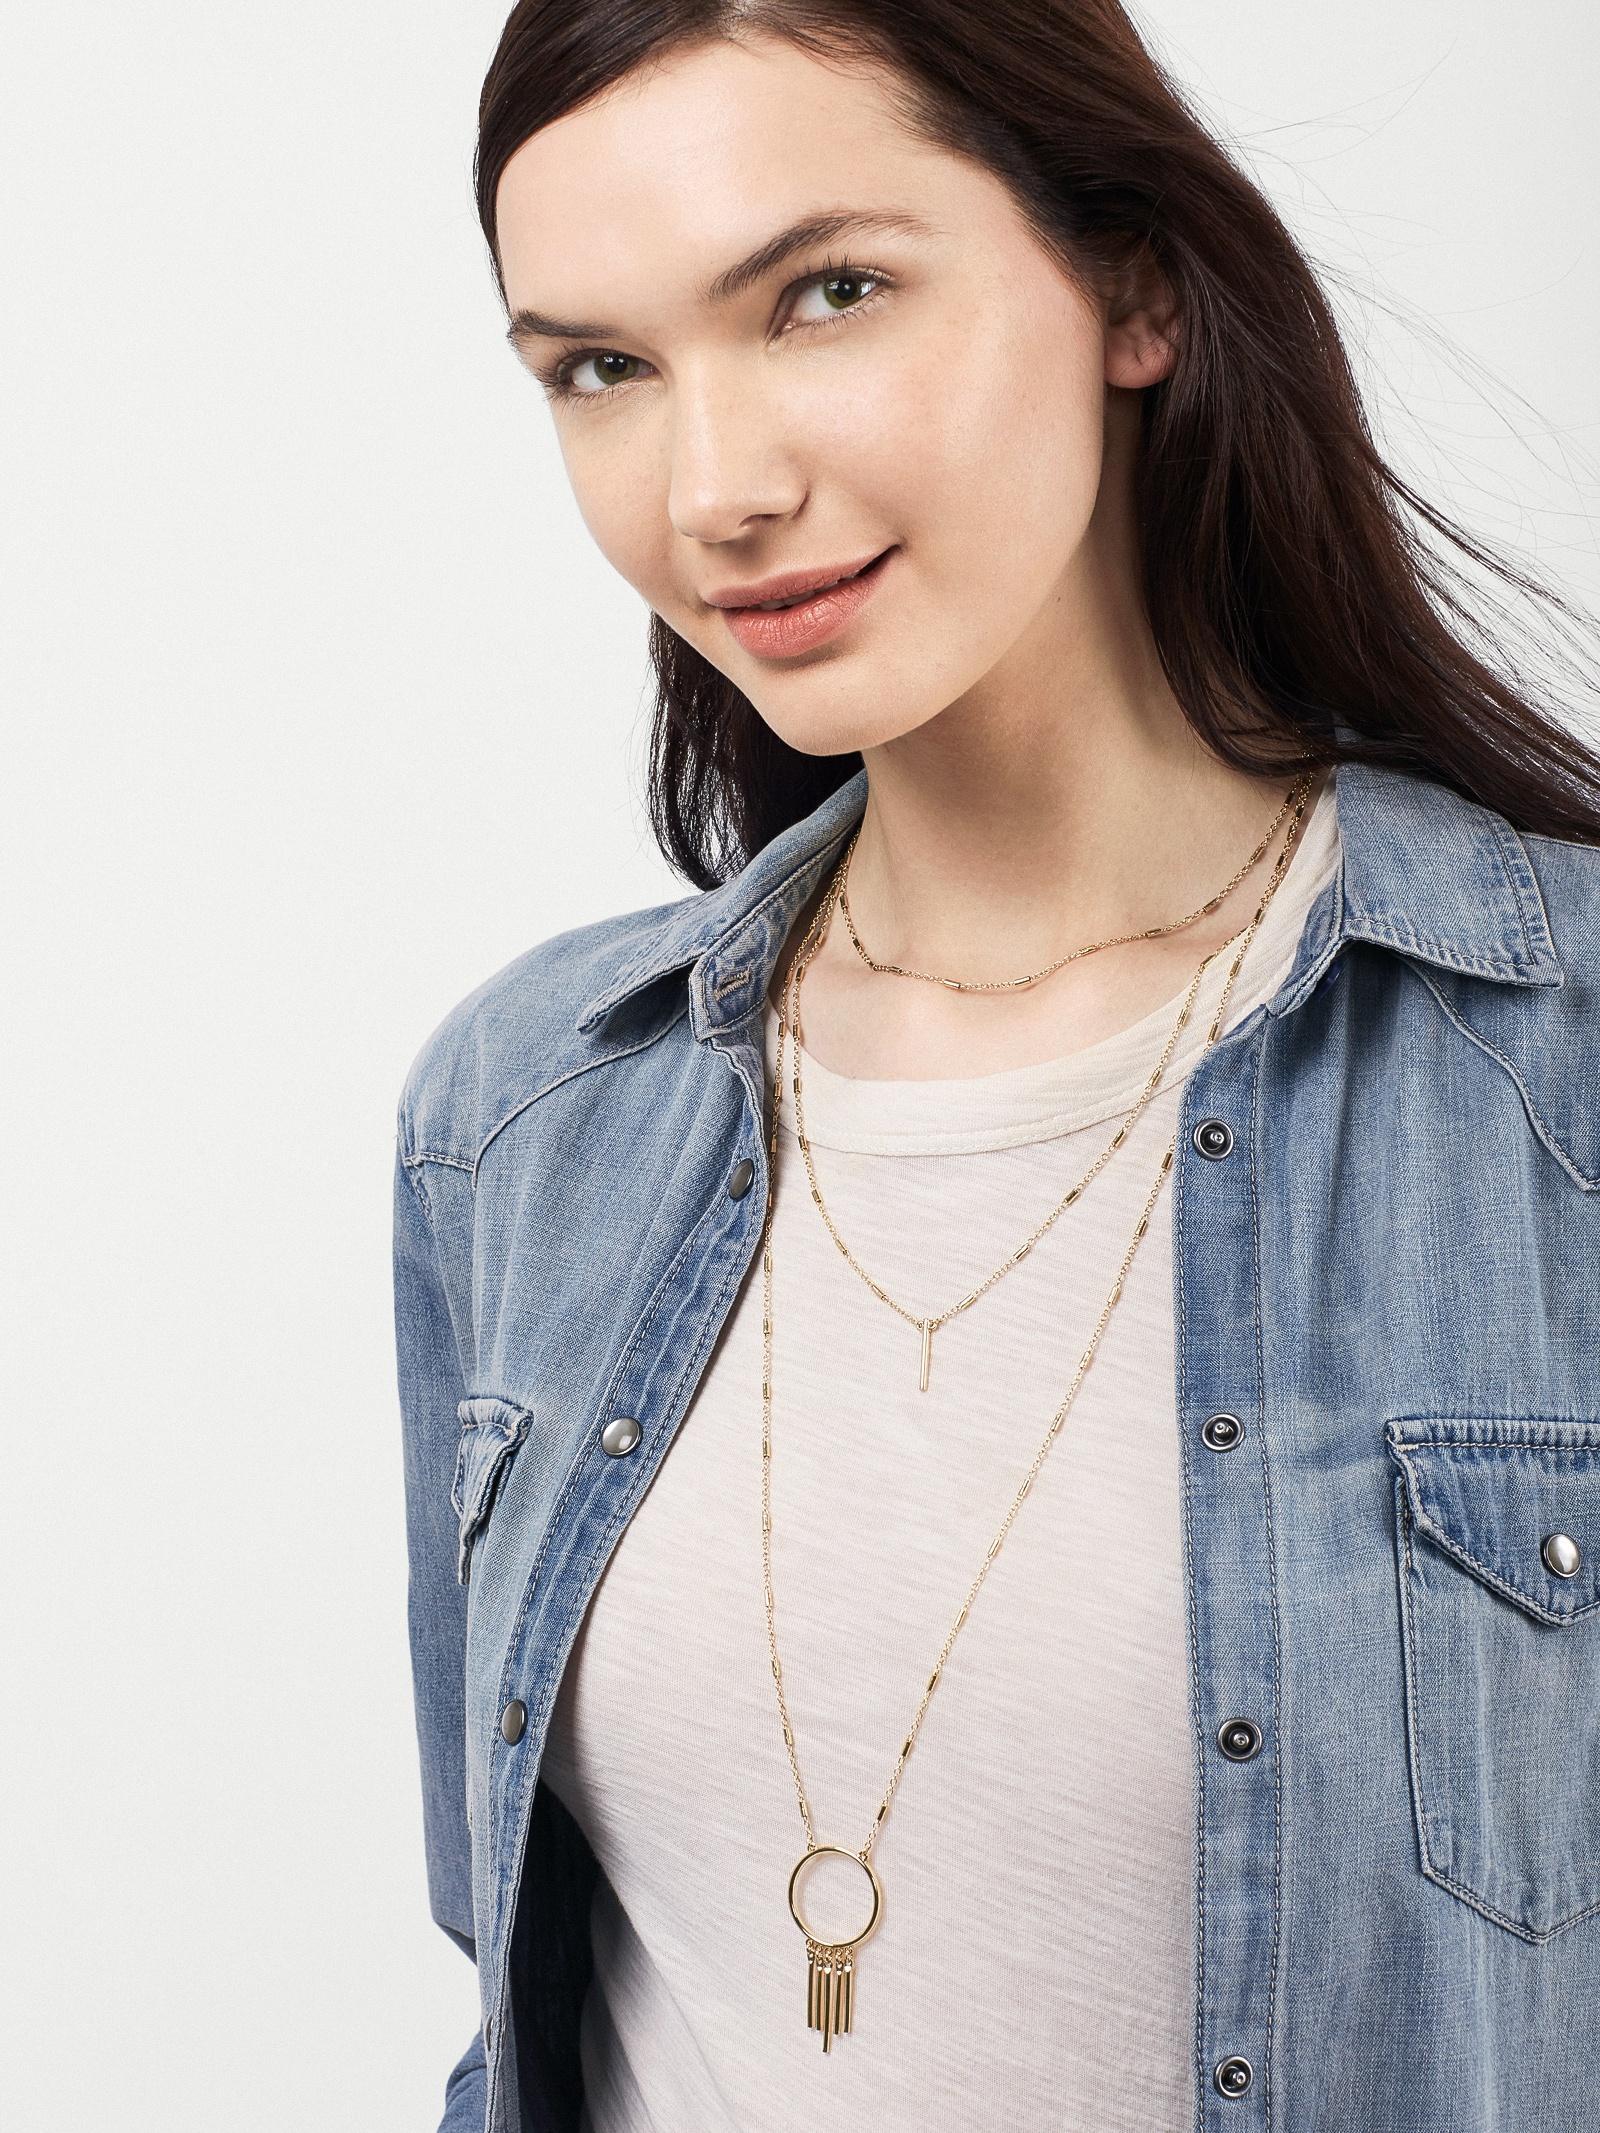 BaubleBar Gypset Layered Necklace in Rose Gold (Metallic)